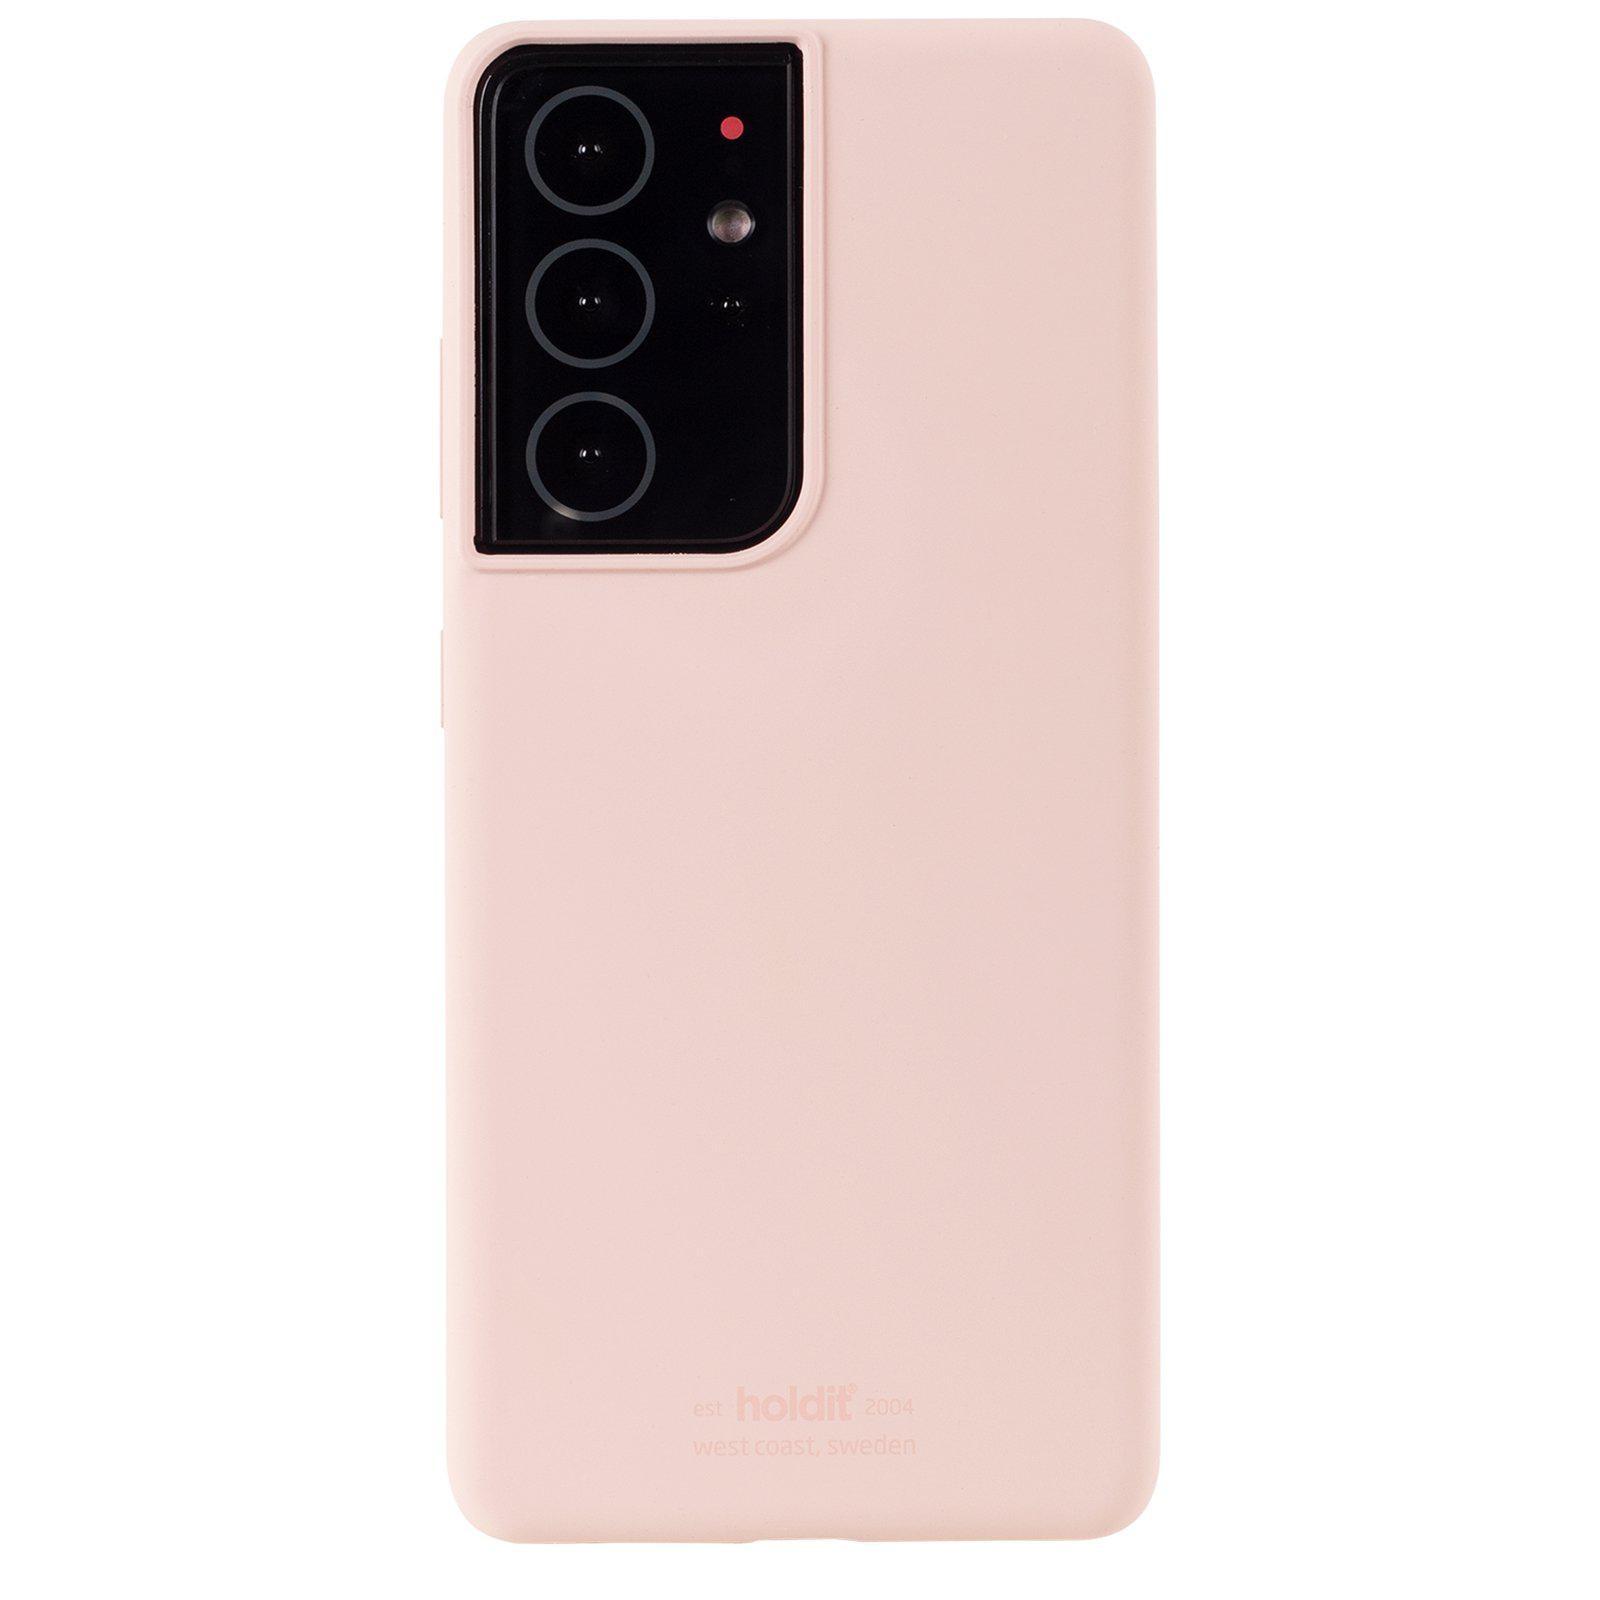 Silikonskal Galaxy S21 Ultra Blush Pink